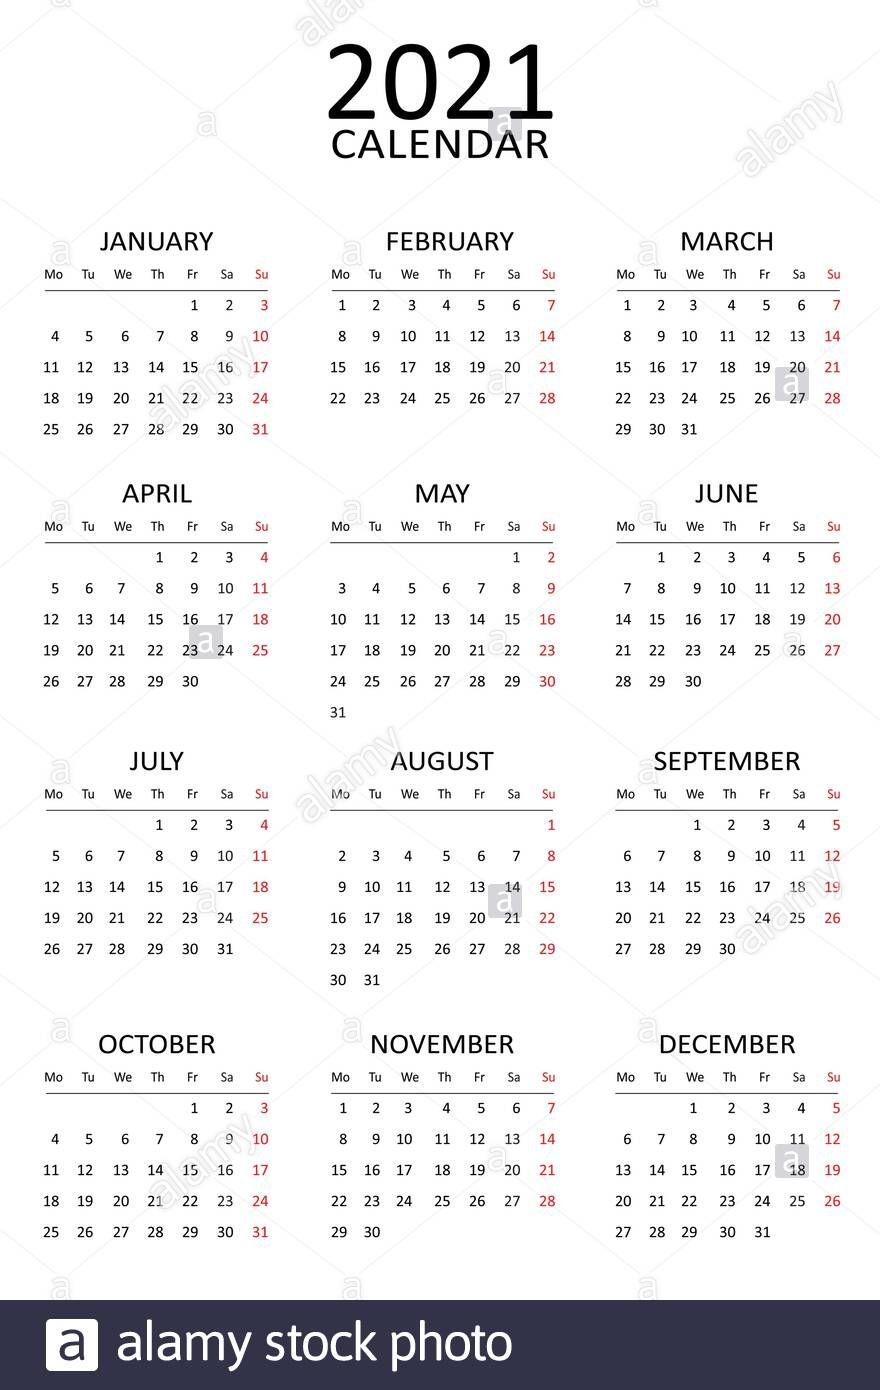 2021 Calendar Template. Simple Black And White Design. Week